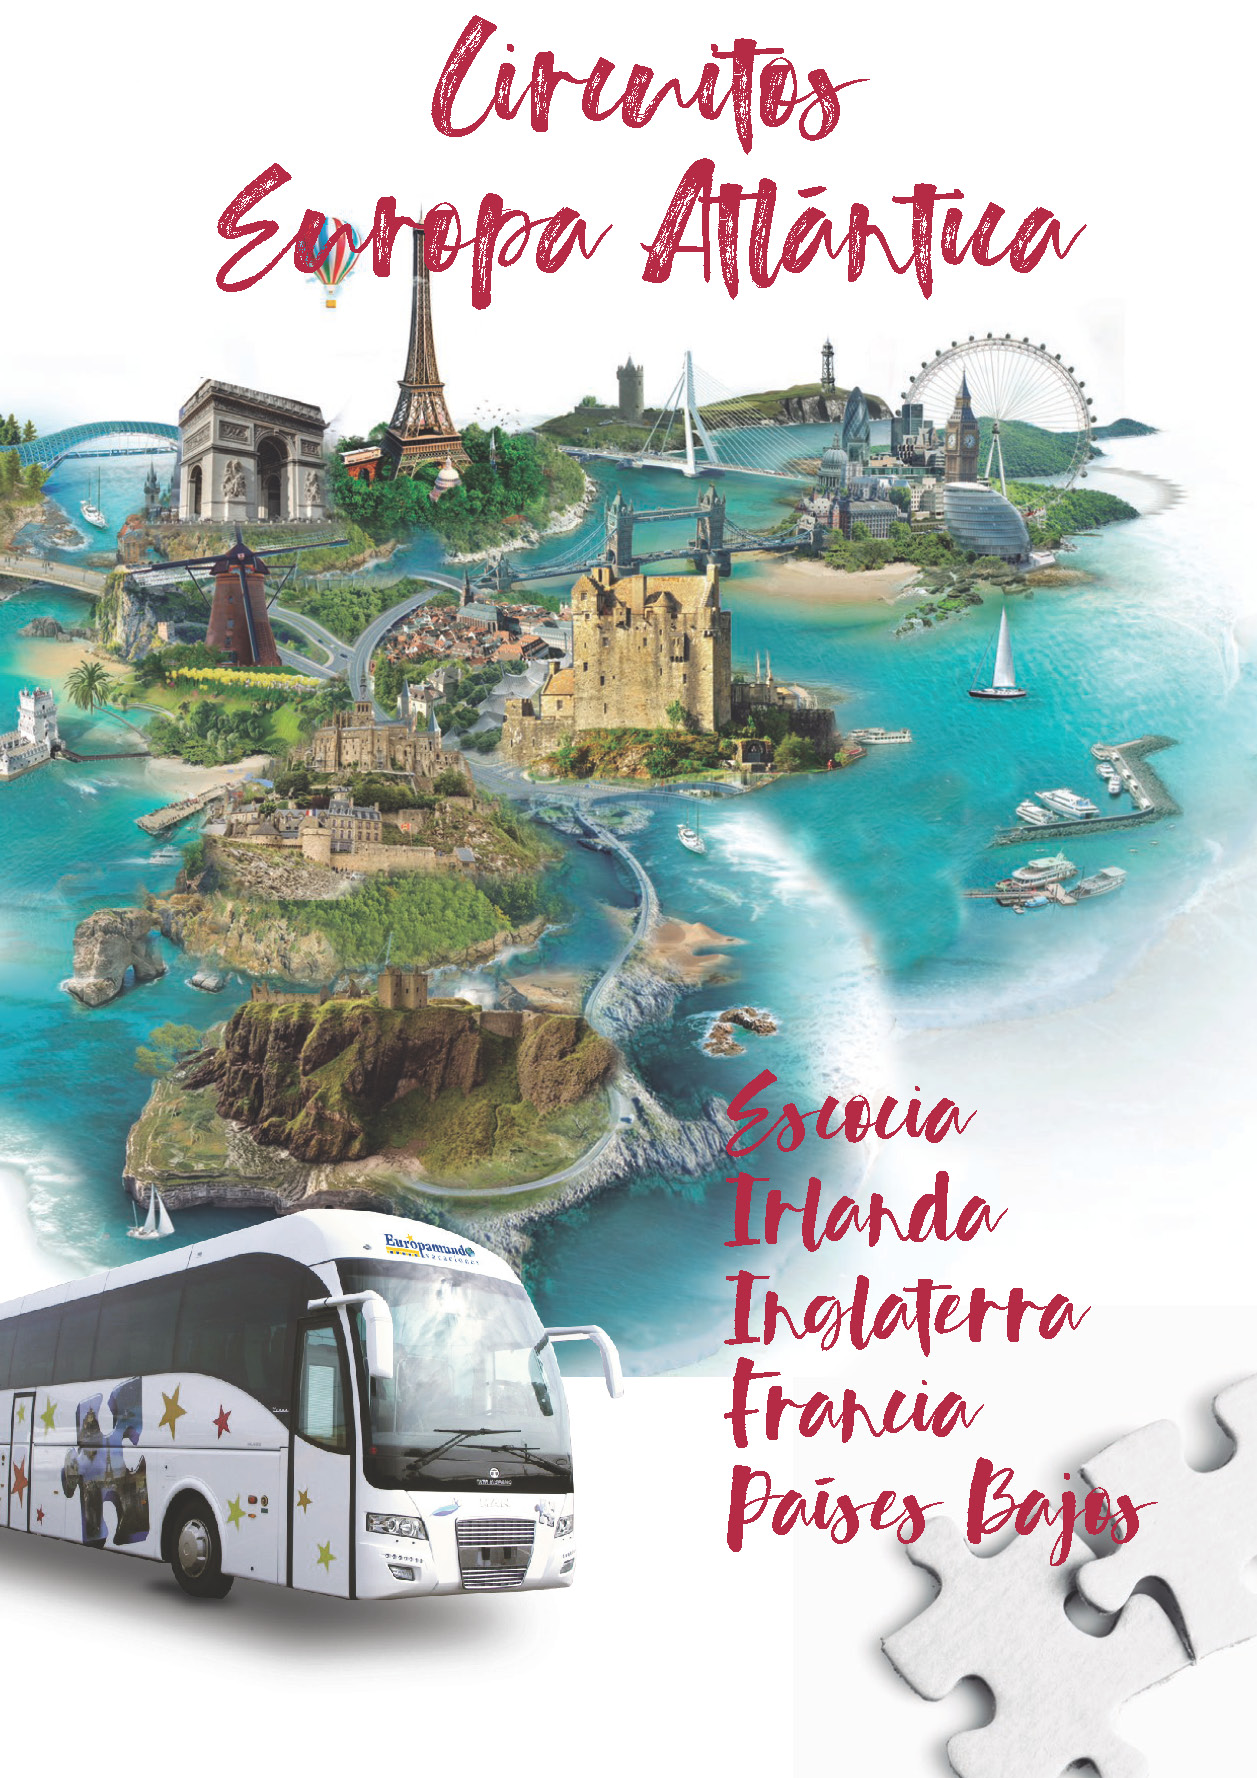 Catalogo Europamundo Vacaciones Europa Atlantica 2018-2019